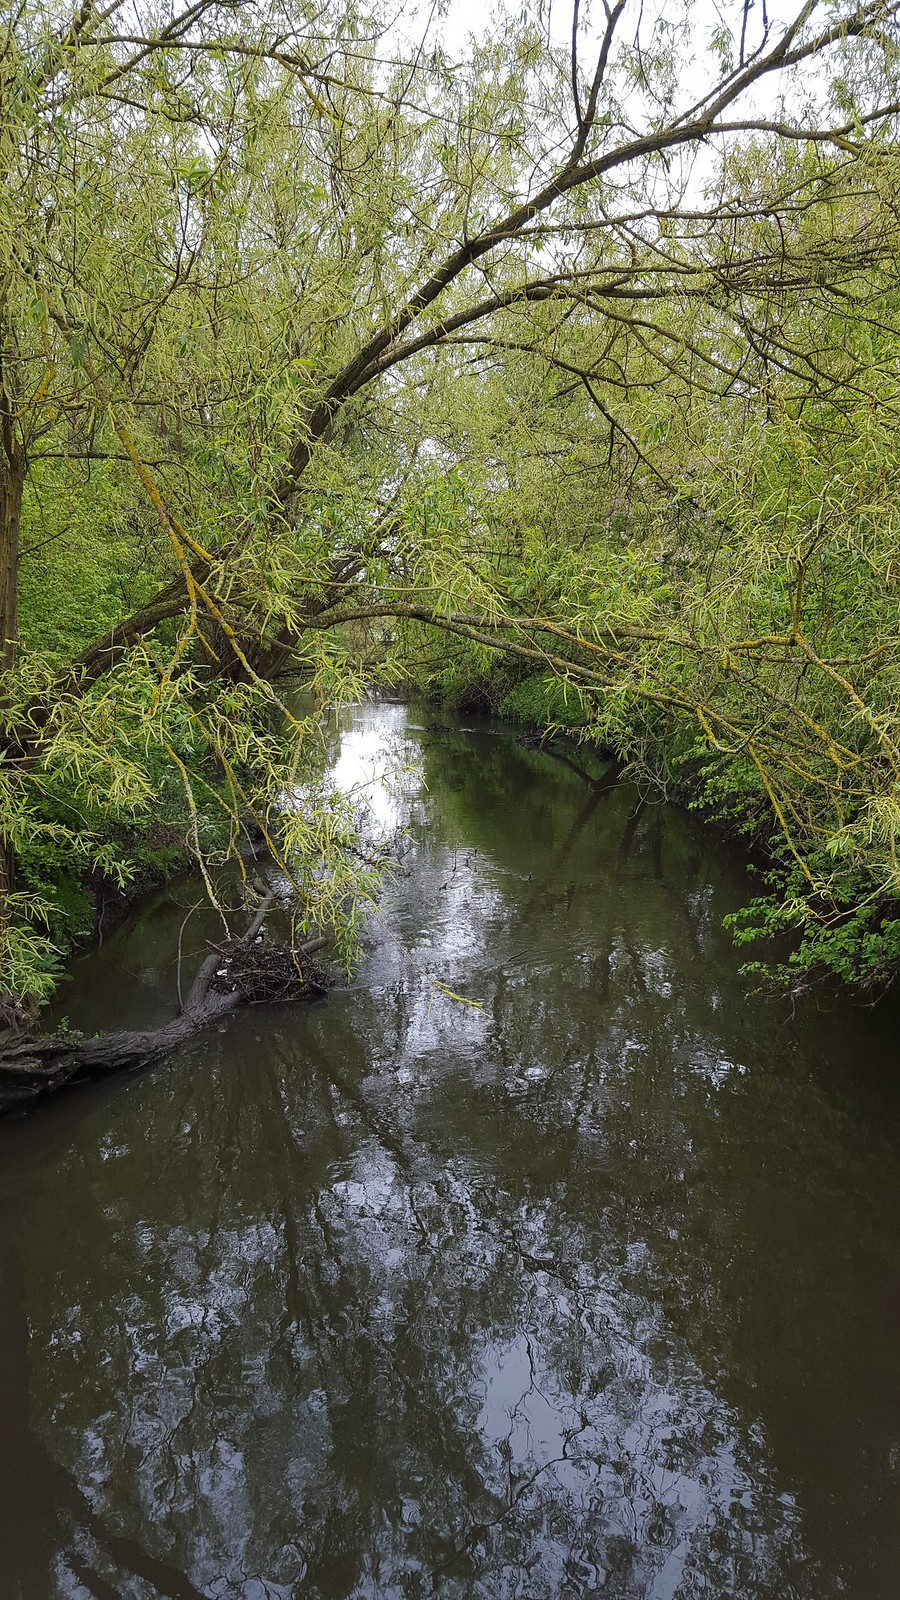 Greenford to Osterley walk